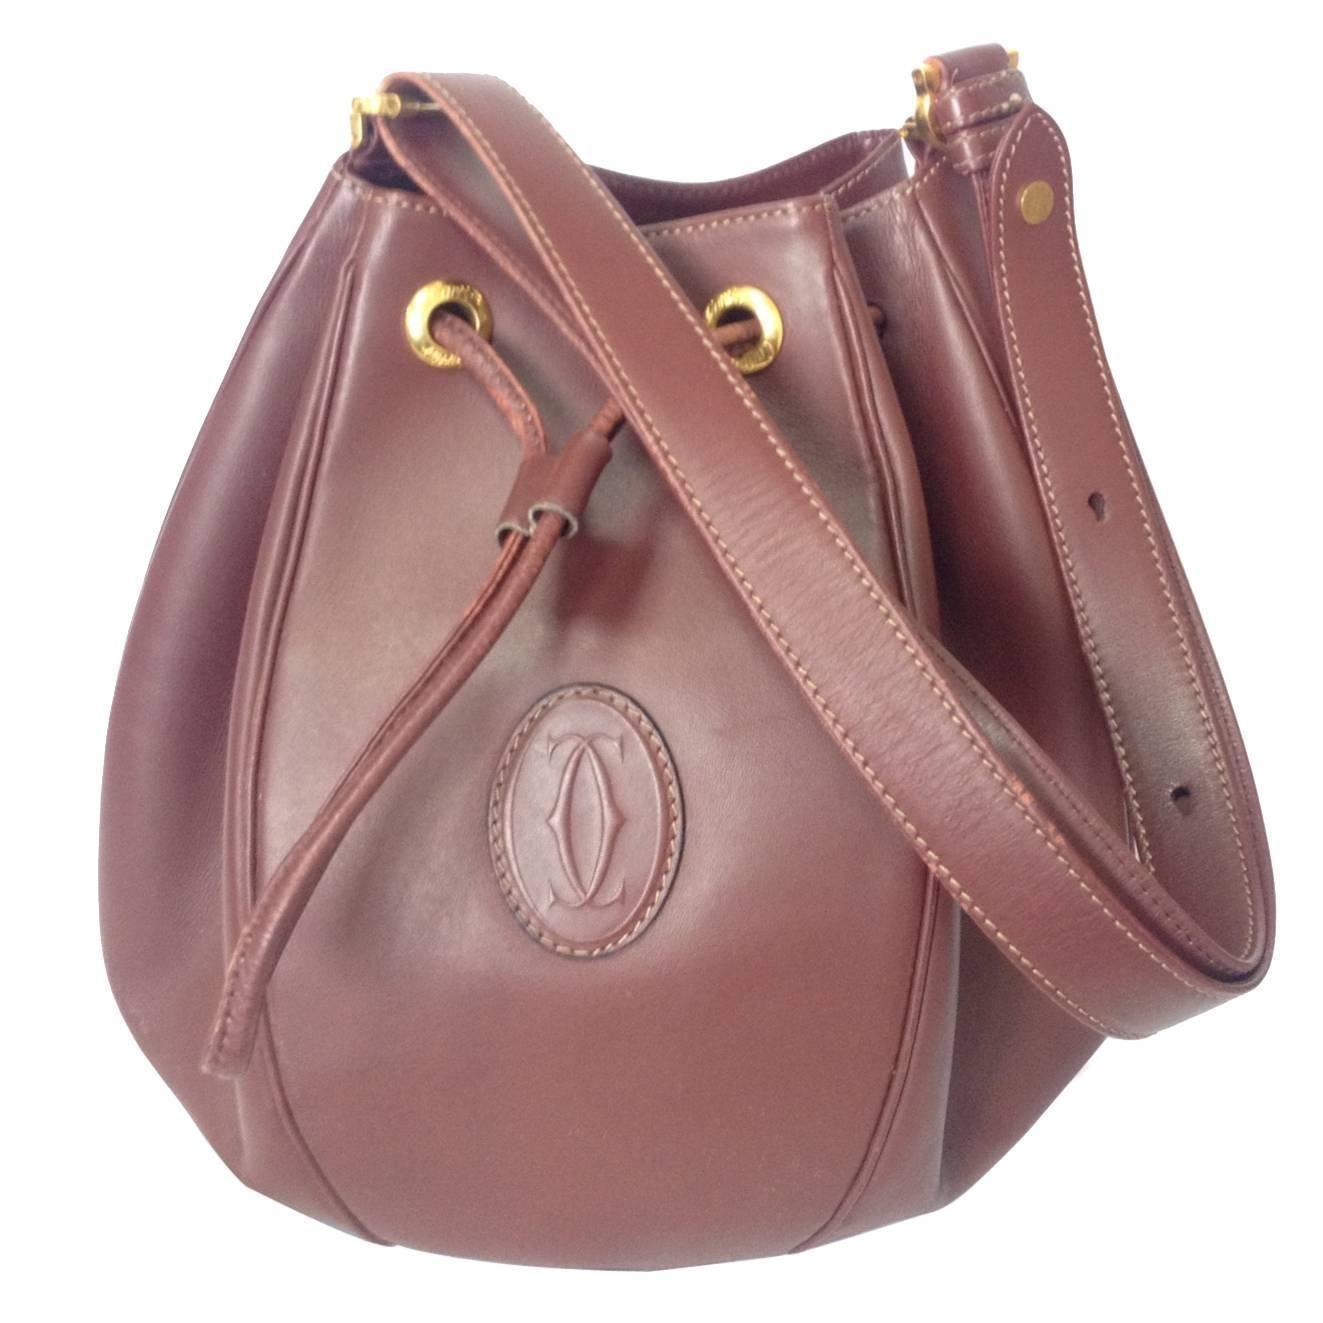 609dd5122d16f5 Vintage Cartier tulip 3 dimension wine leather hobo bucket shoulder bag.  must de